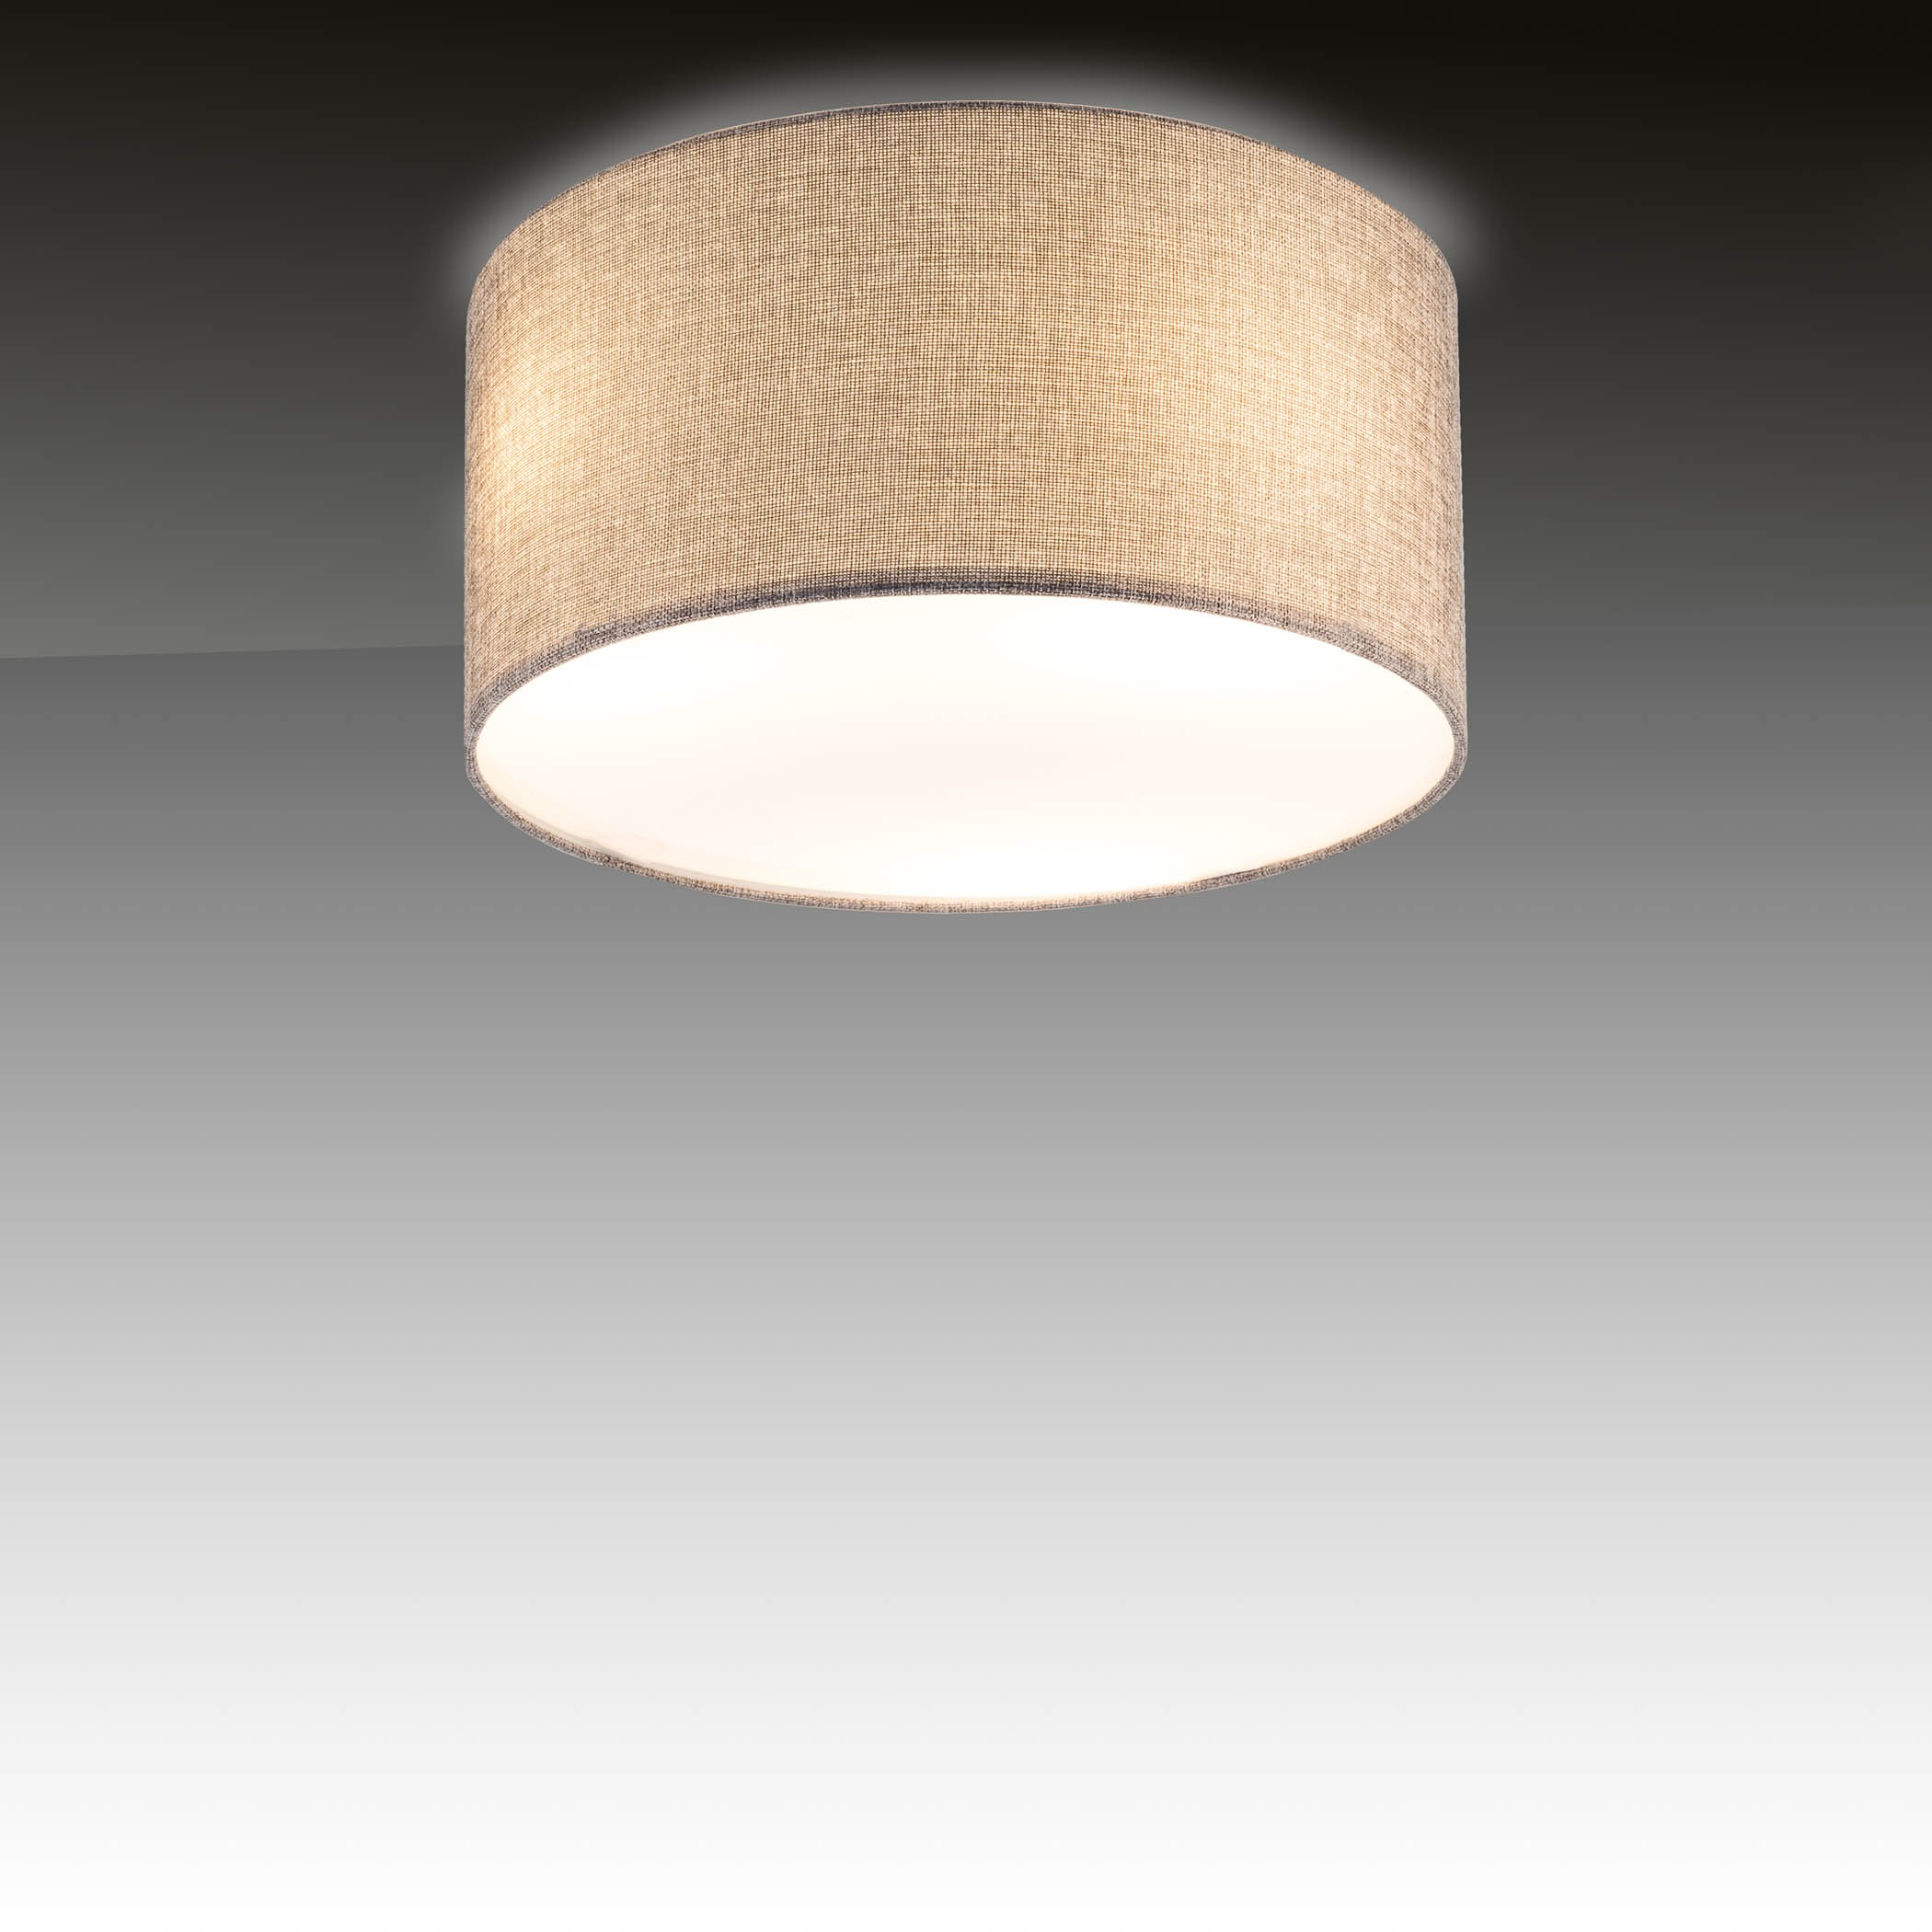 Deckenlampe grau stoff textil led lampe e w